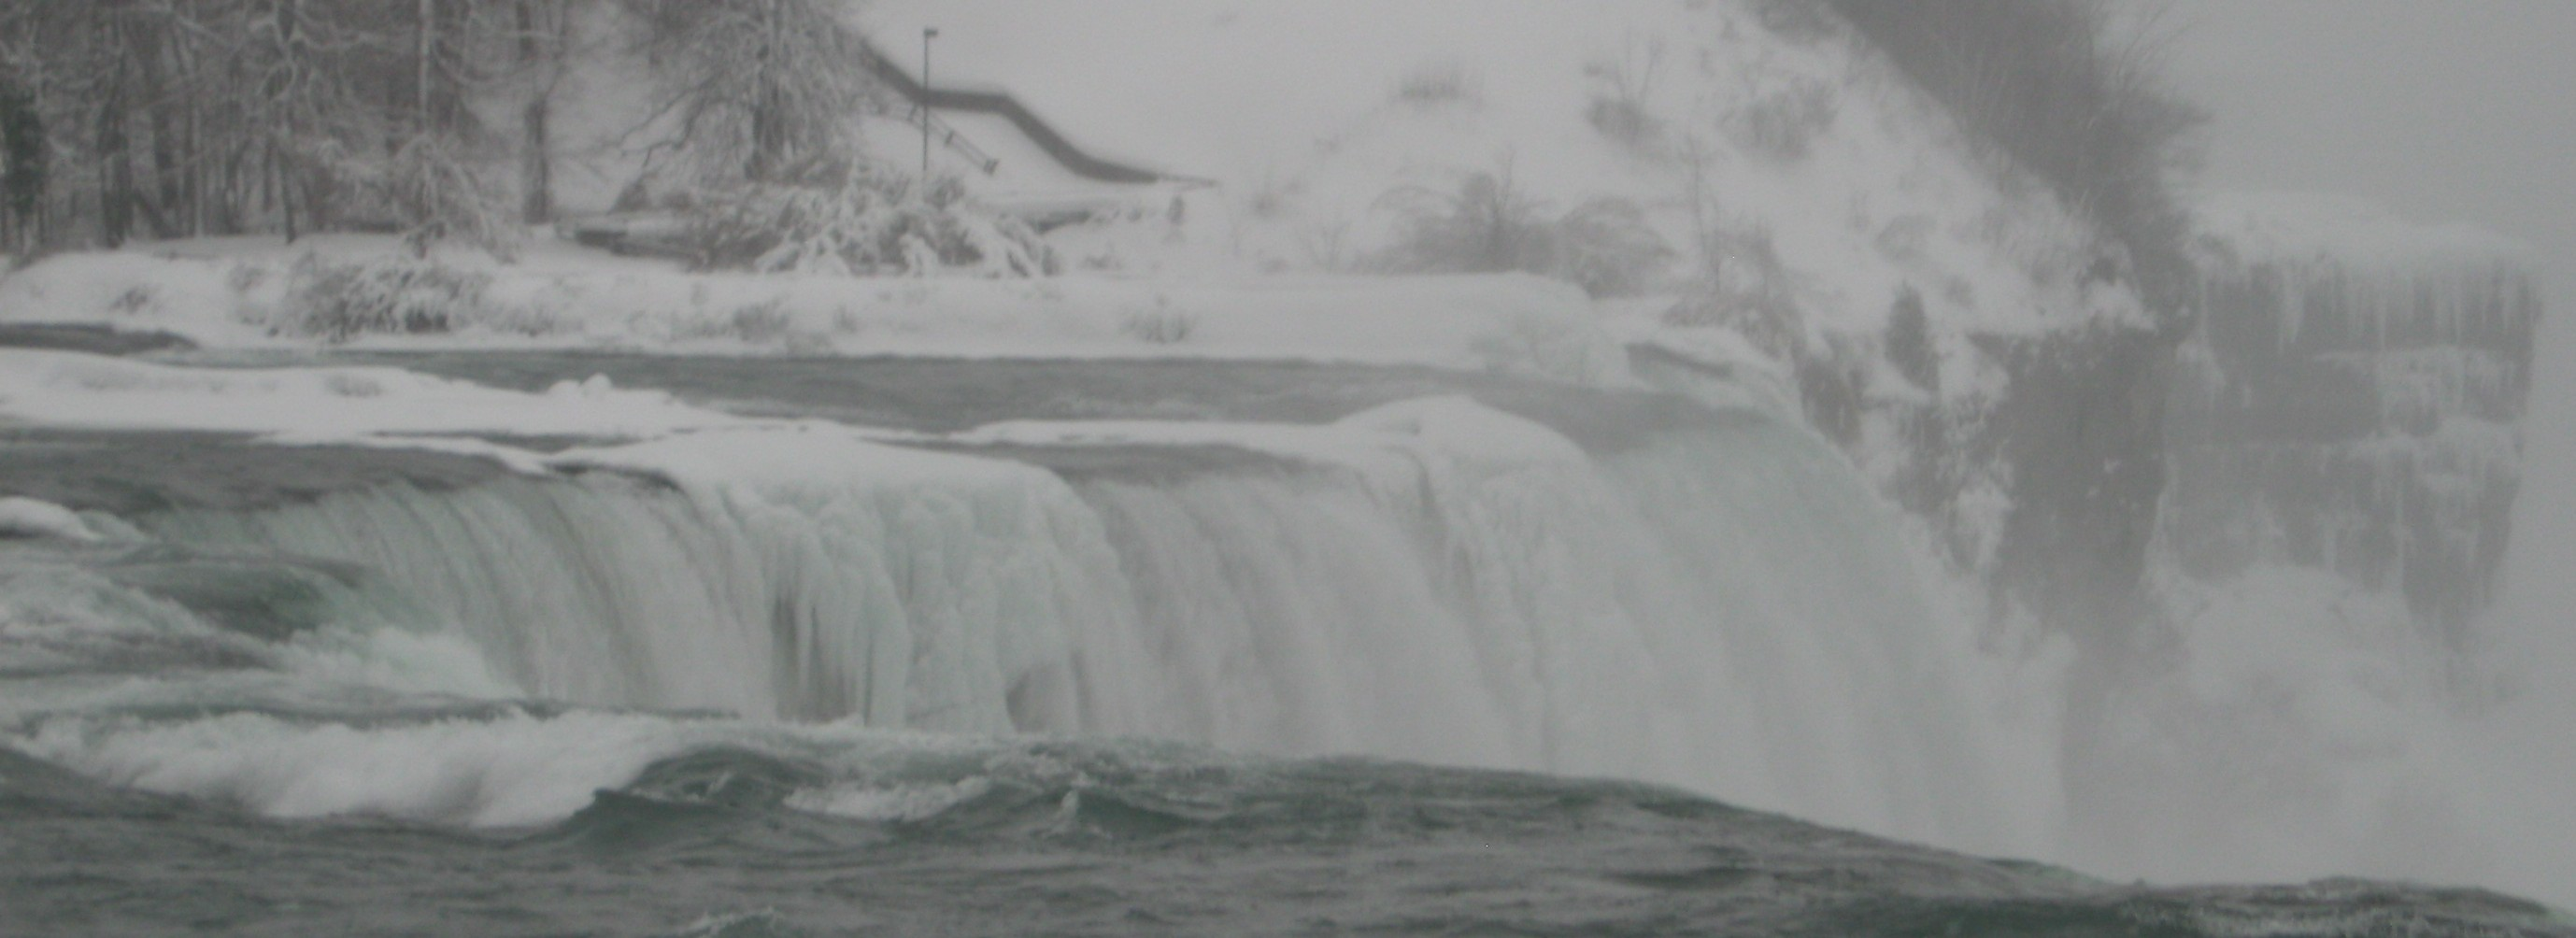 Top of Niagara